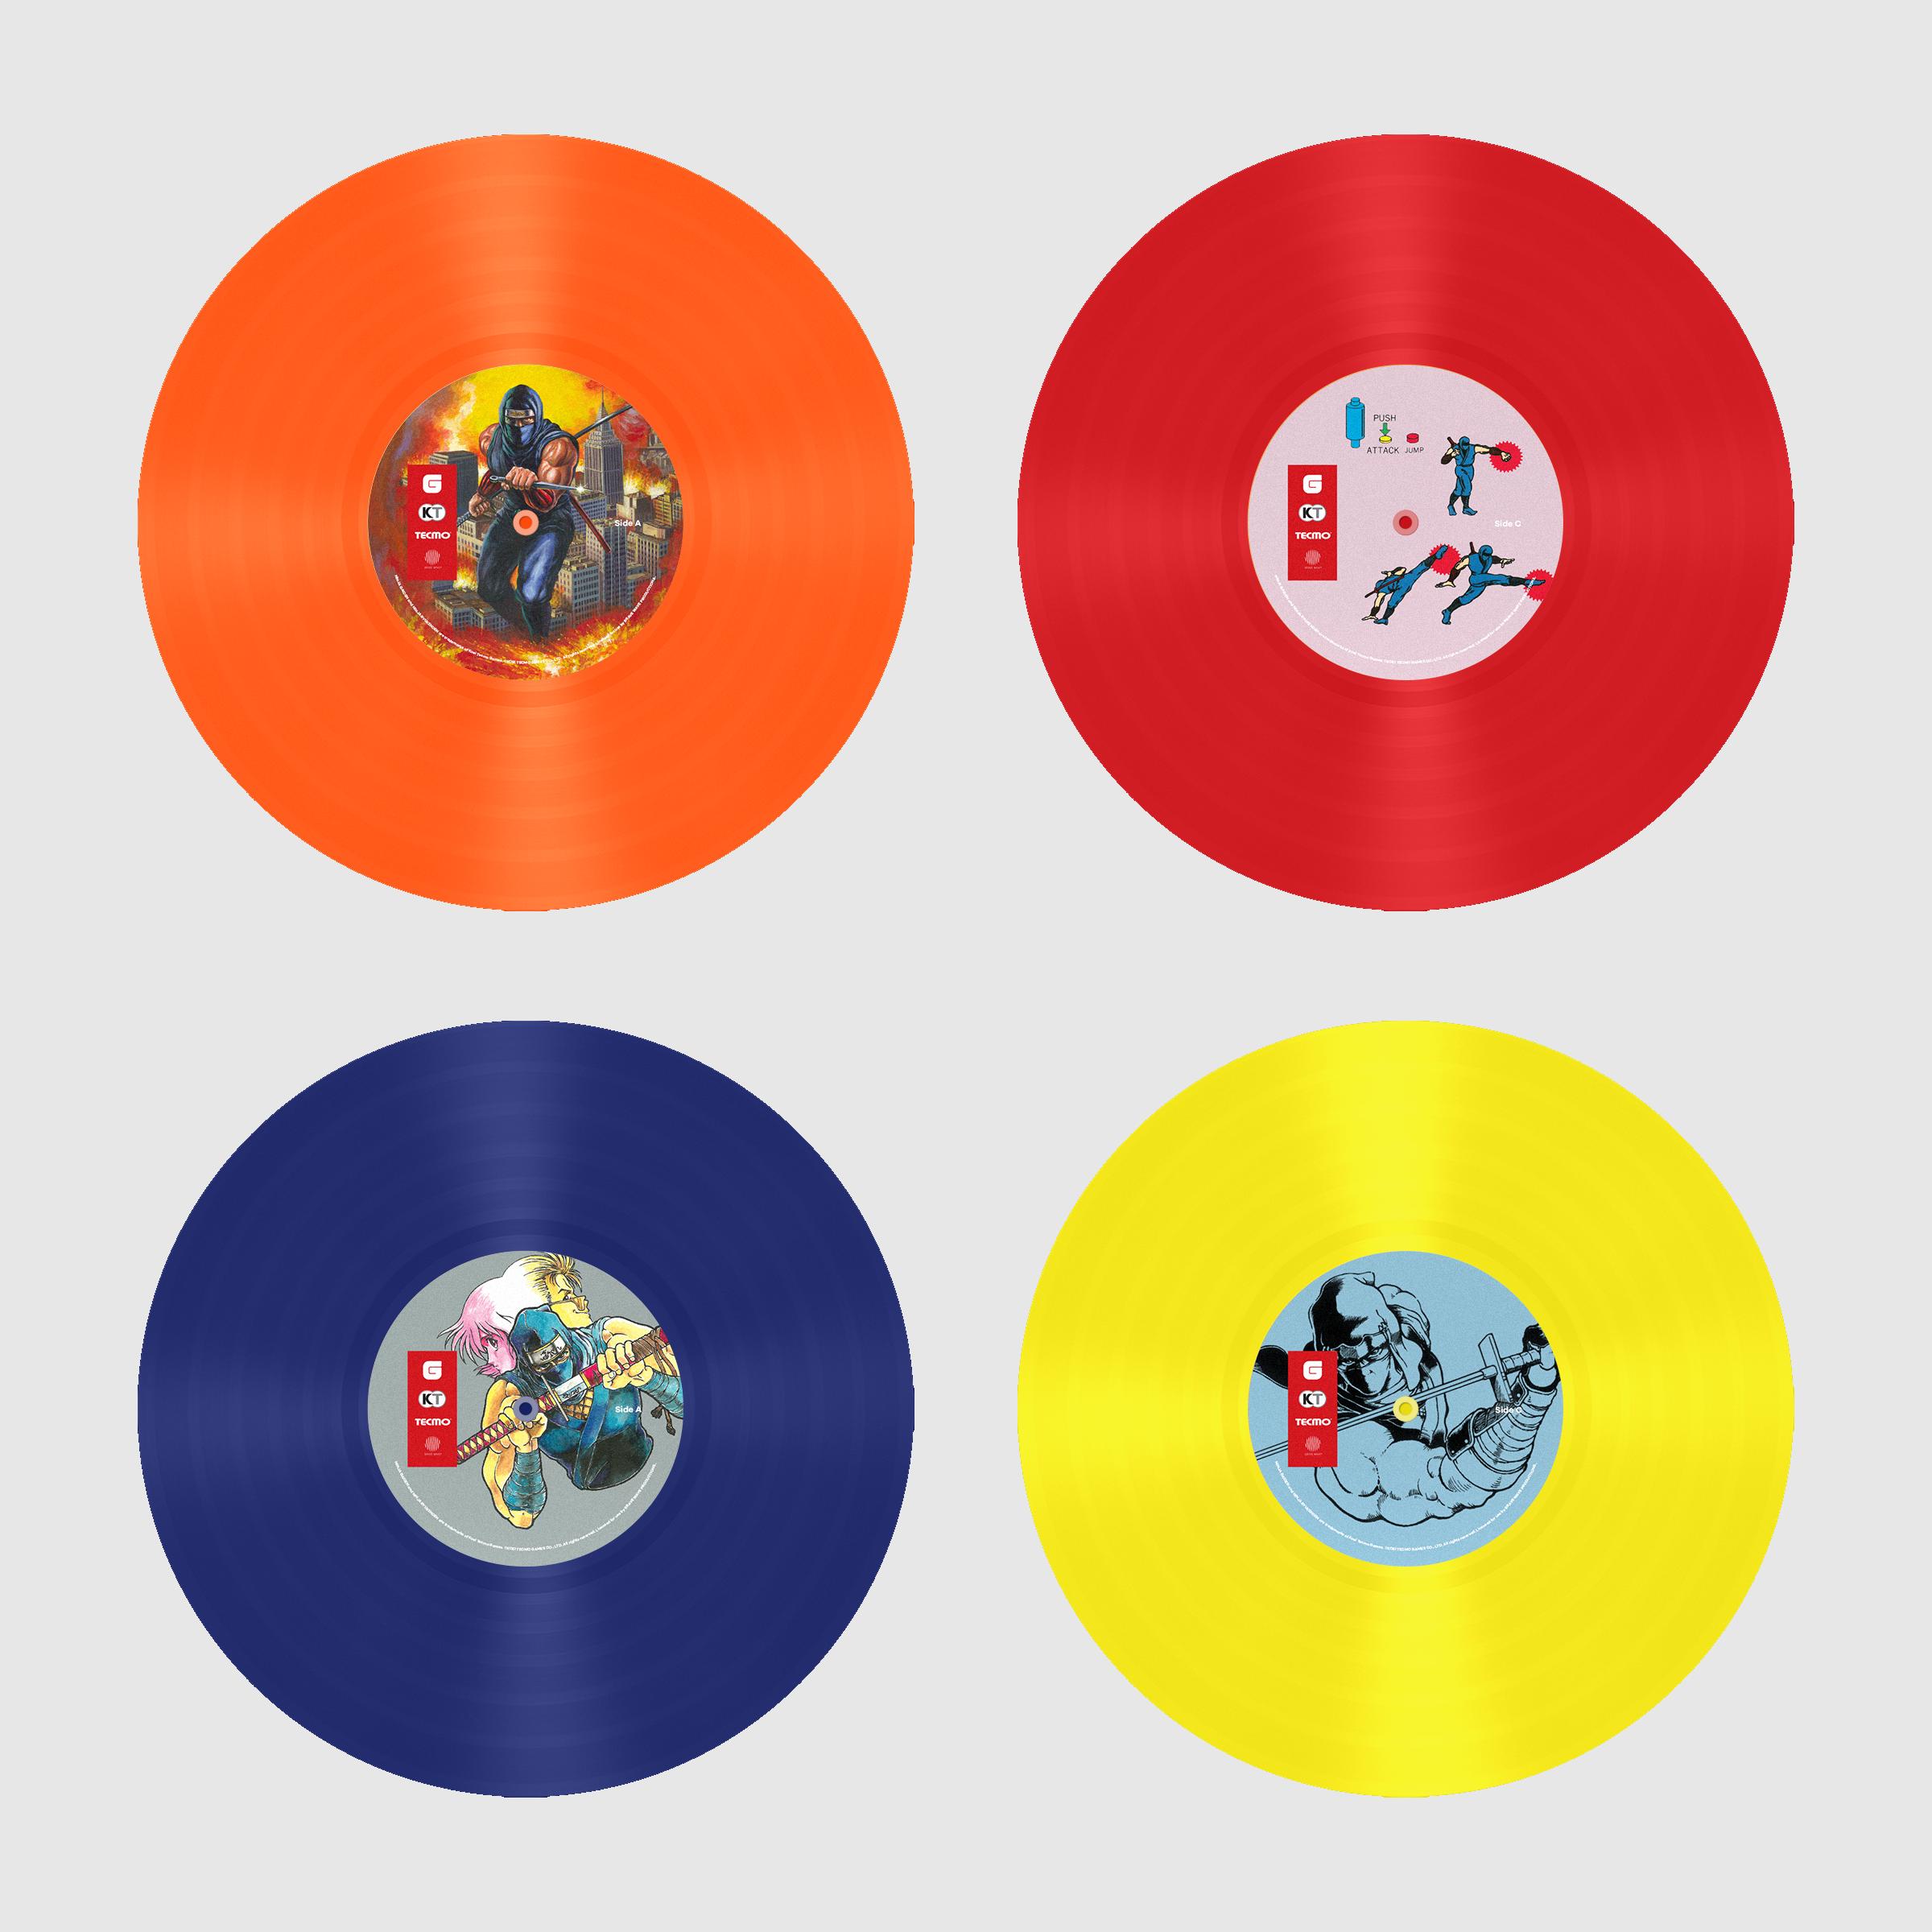 Top Row: Ninja Gaiden The Definitive Soundtrack Vol. 1 Colored Vinyl and Label Designs Bottom Row: Ninja Gaiden The Definitive Soundtrack Vol. 2 Colored Vinyl and Label Designs